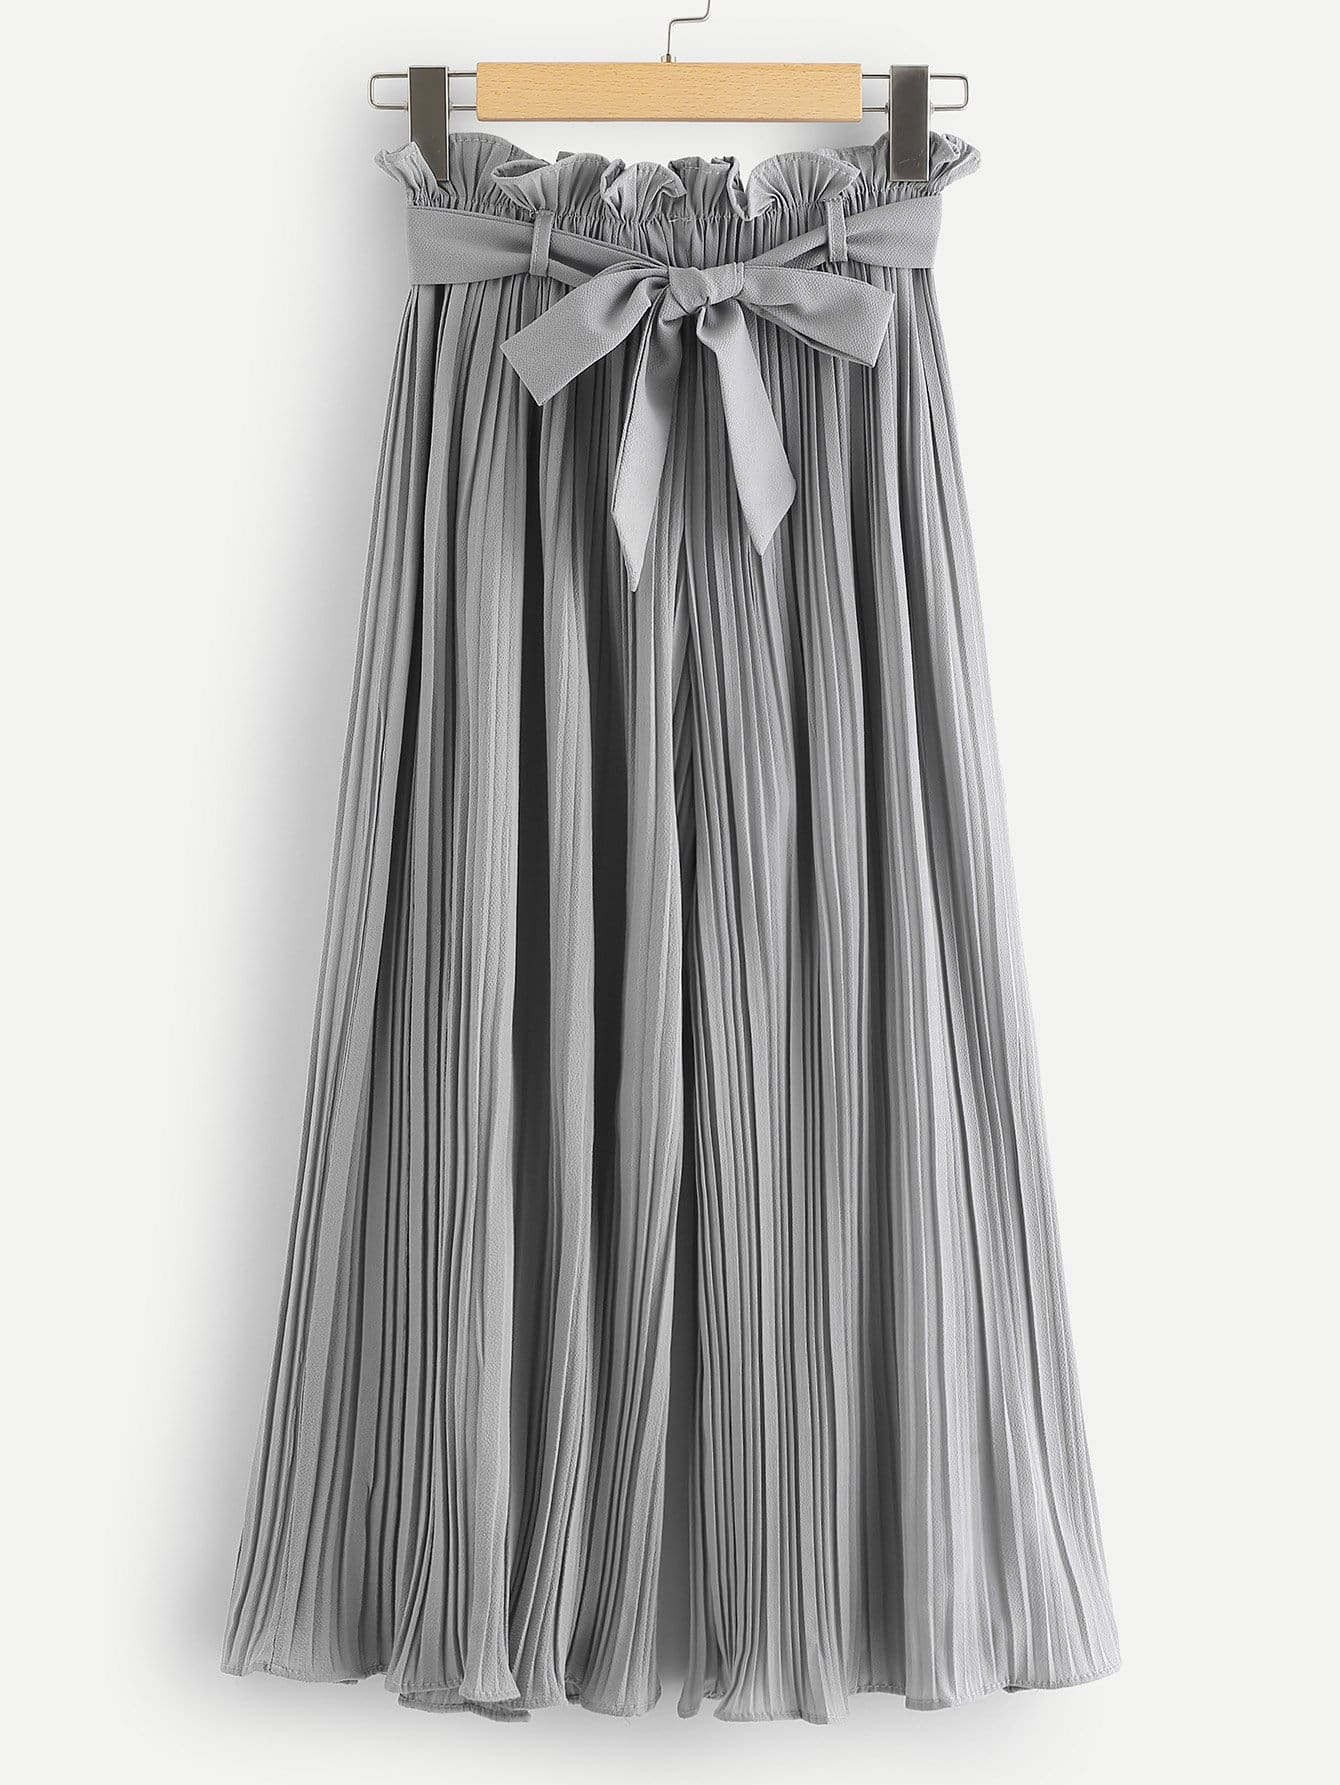 Ruffle Waist Belted Pleated Pants ruffle waist belted peg pants